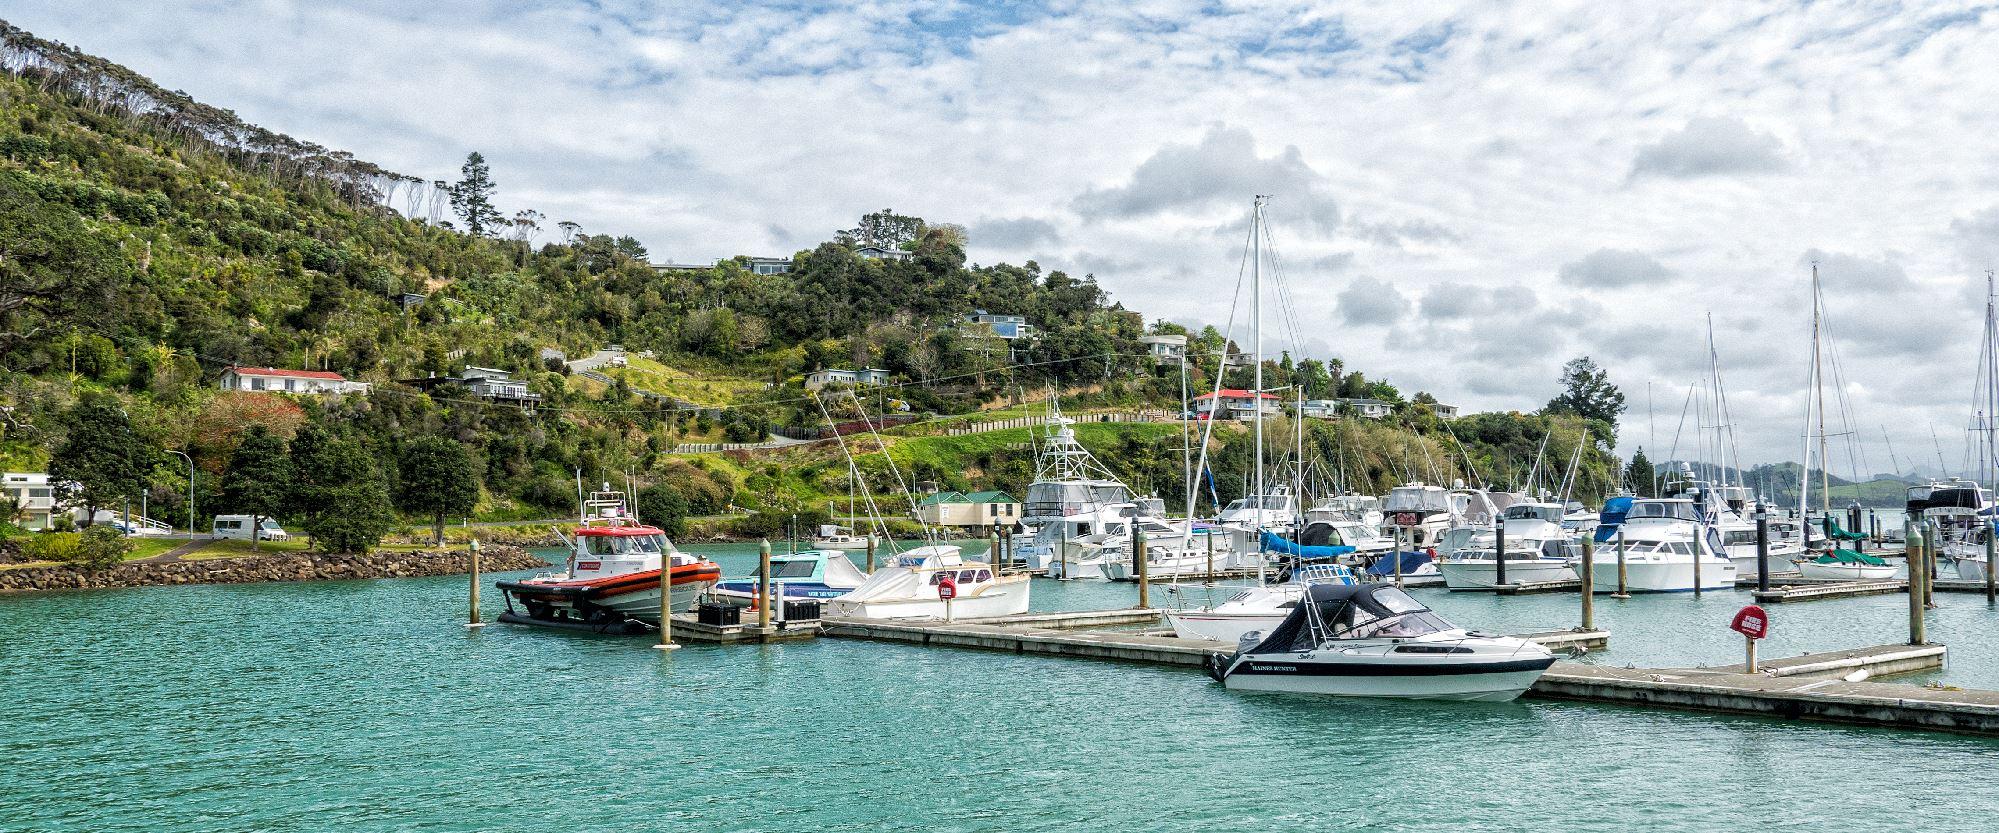 whangaroa harbour new zealand